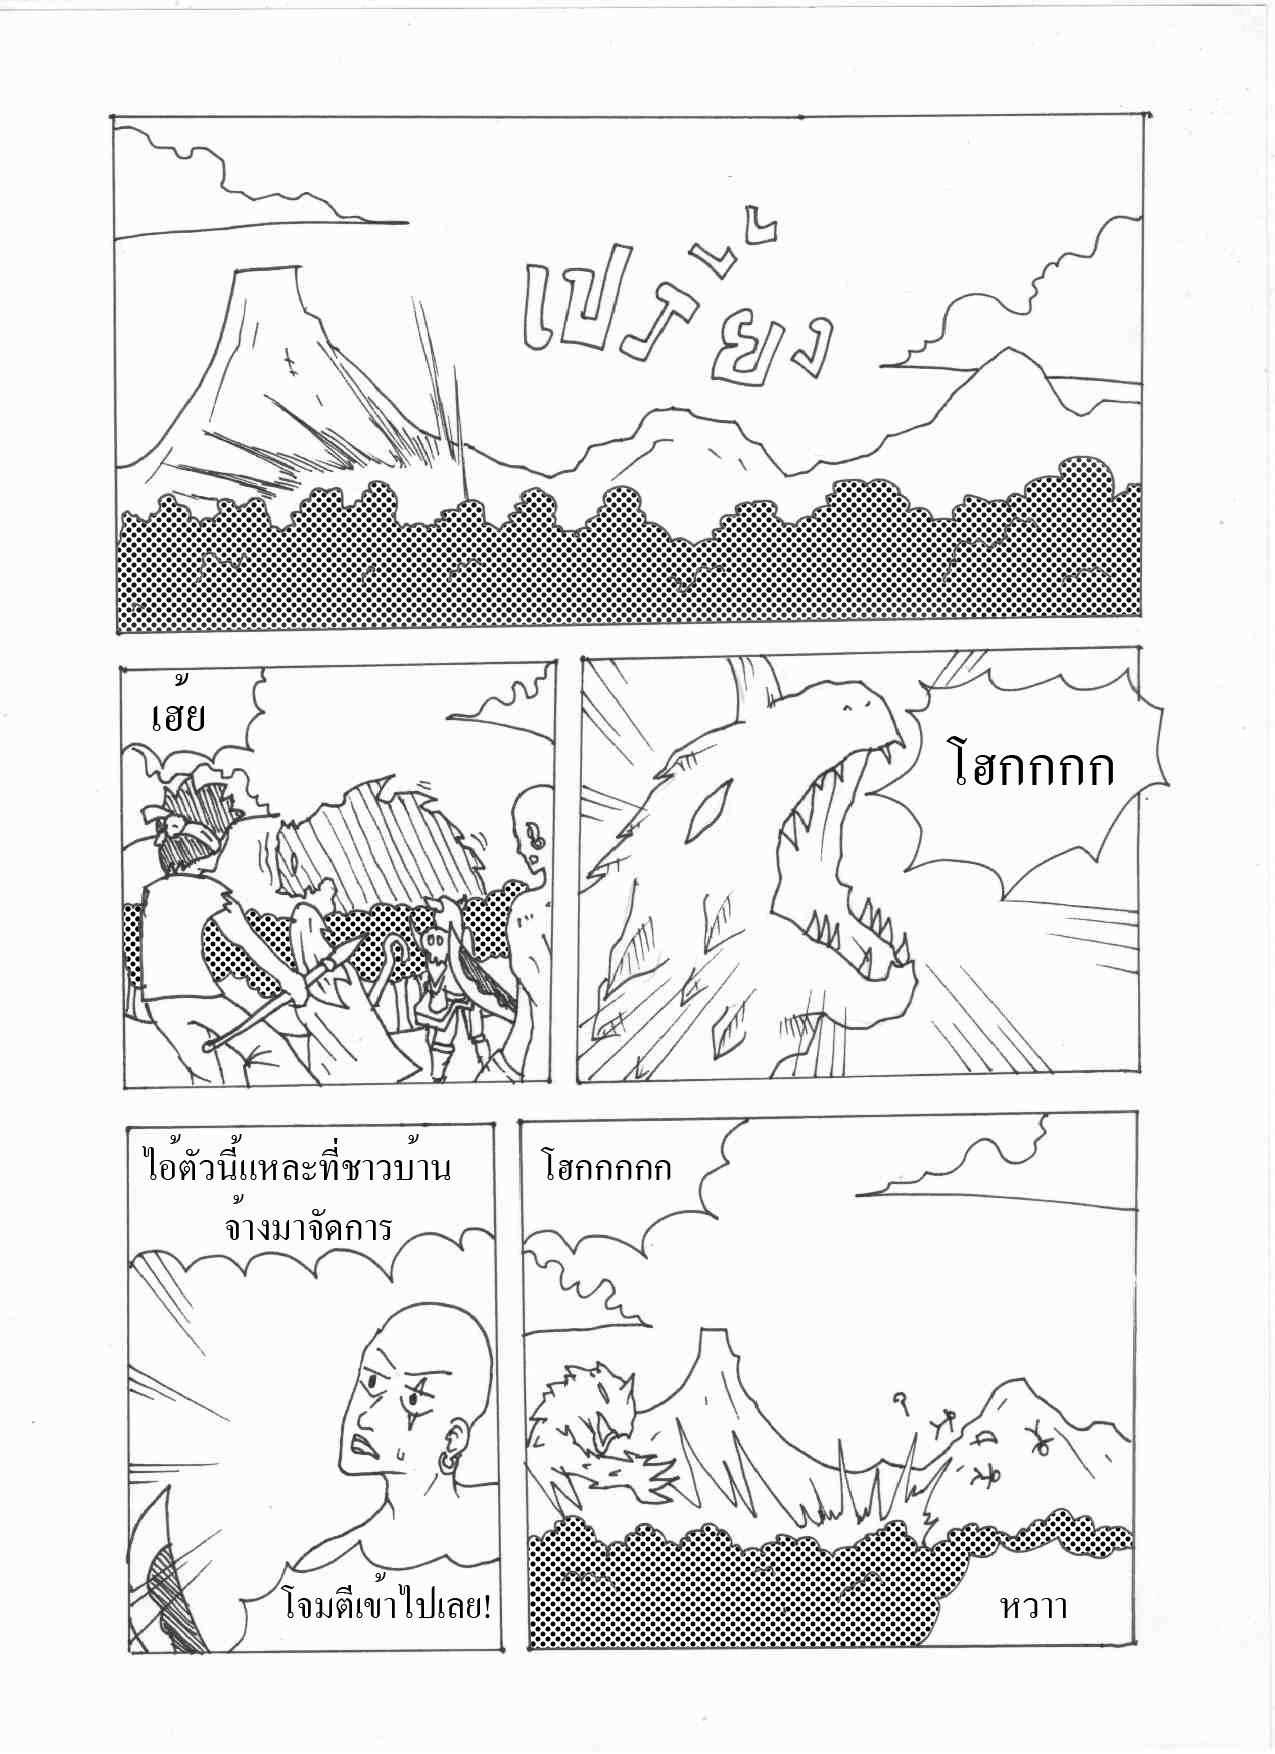 [Character CF 2.5]วันฮันเดรด ทู(ทู) [พร้อมอินโทร,ภาพสี] Intro1